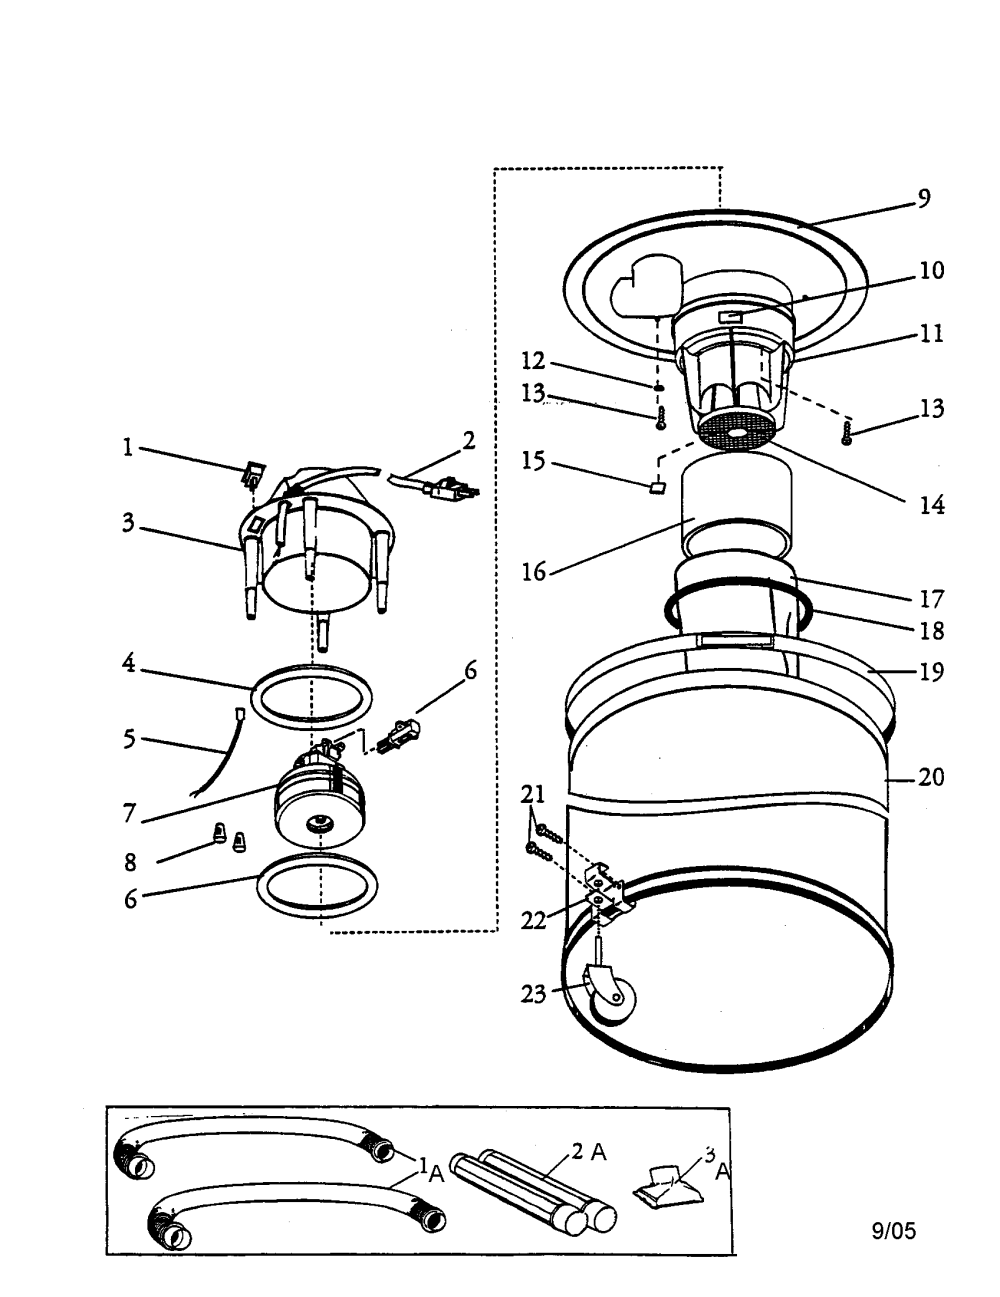 medium resolution of shop vac model 2010 wiring diagram